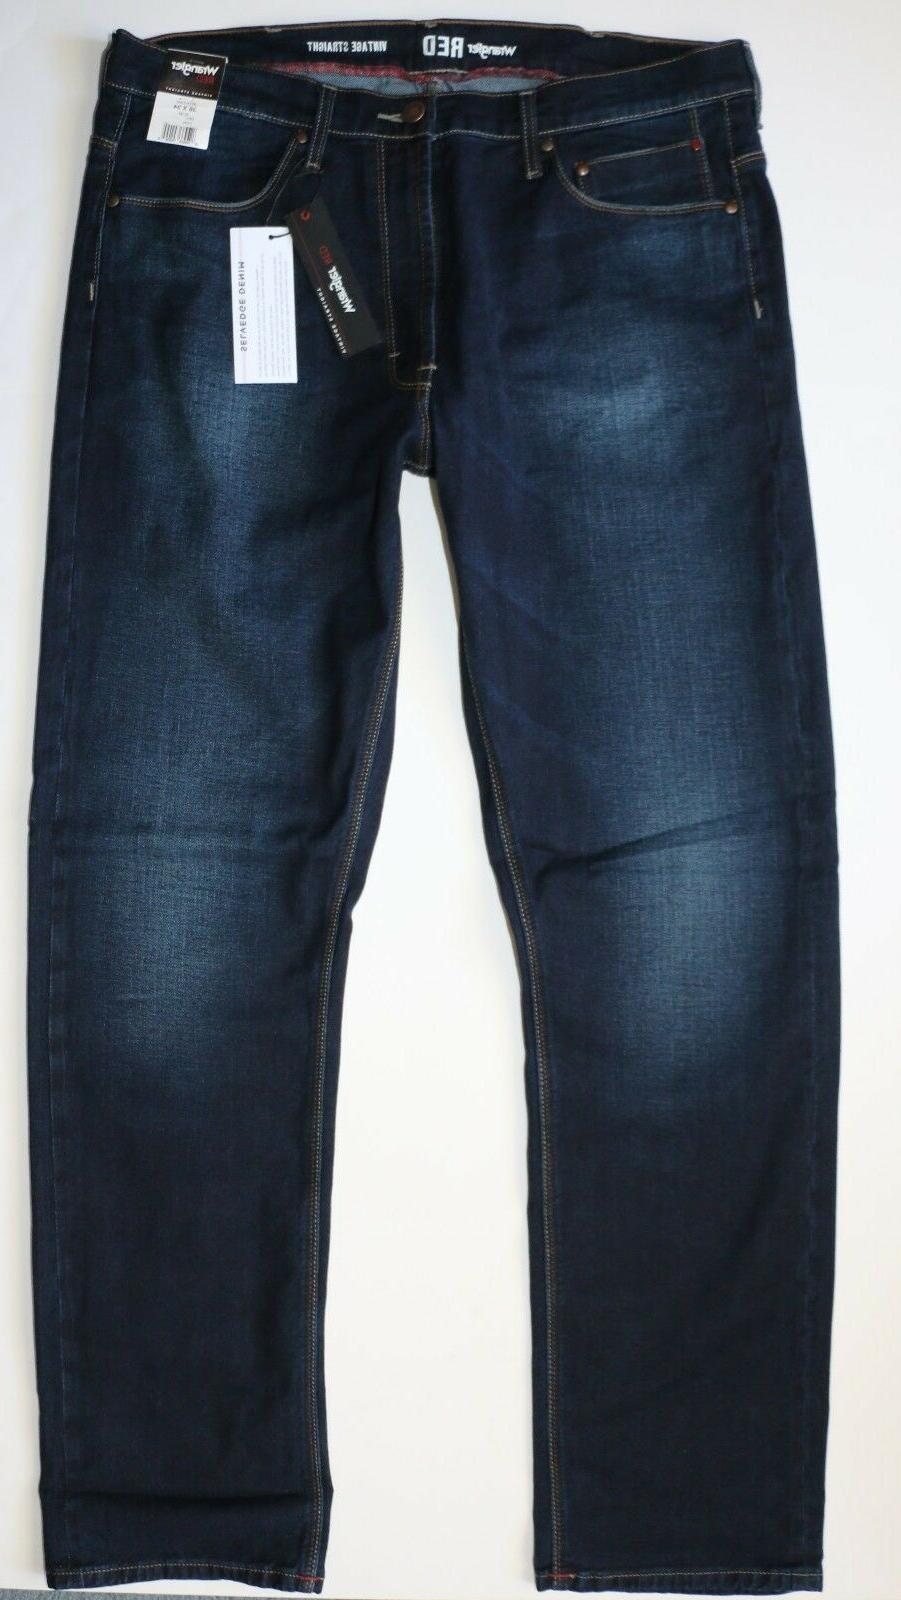 New Flex Fit Jeans Japanese Denim Men's Sizes